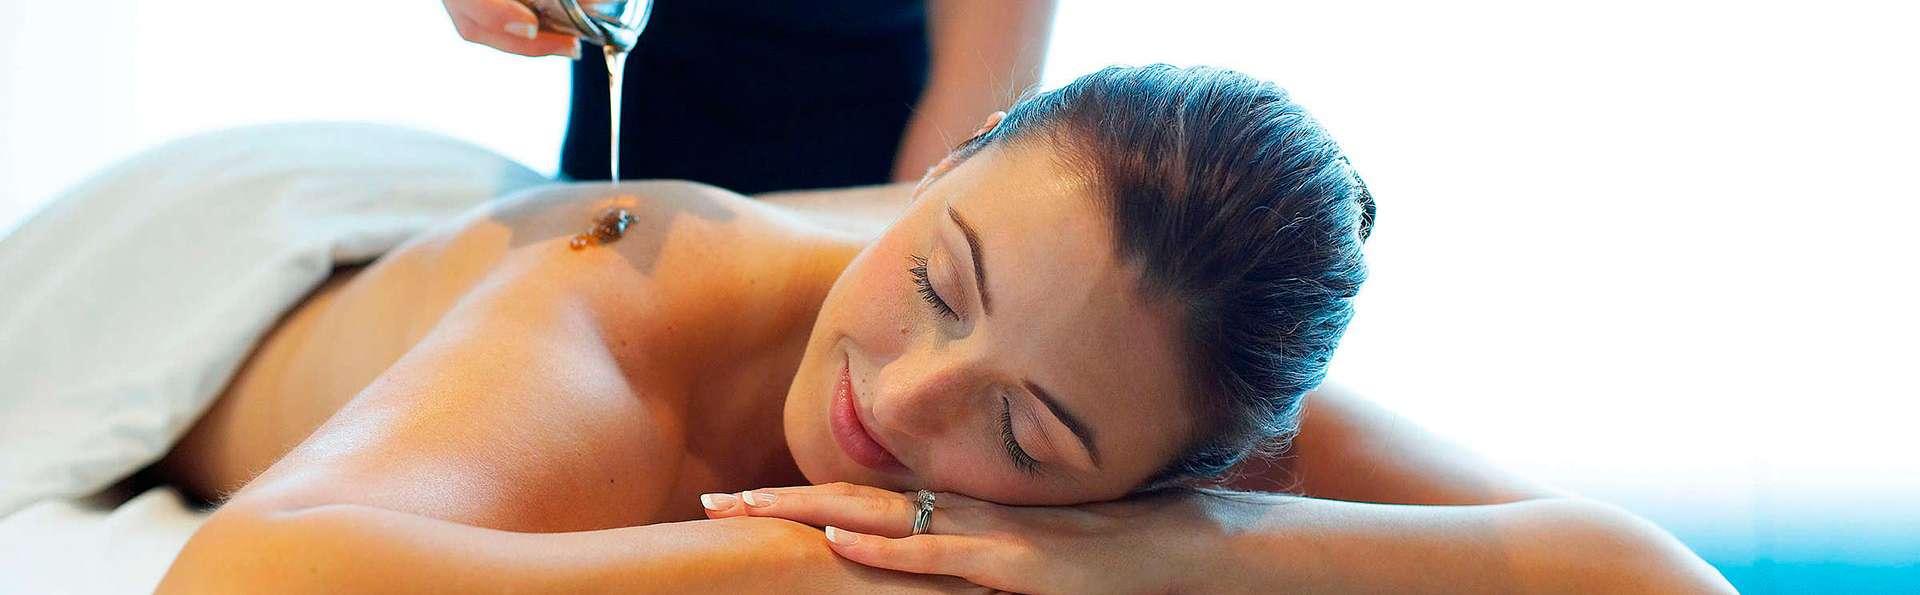 Fin de semana Thalasso con masaje junto al mar, en Biarritz